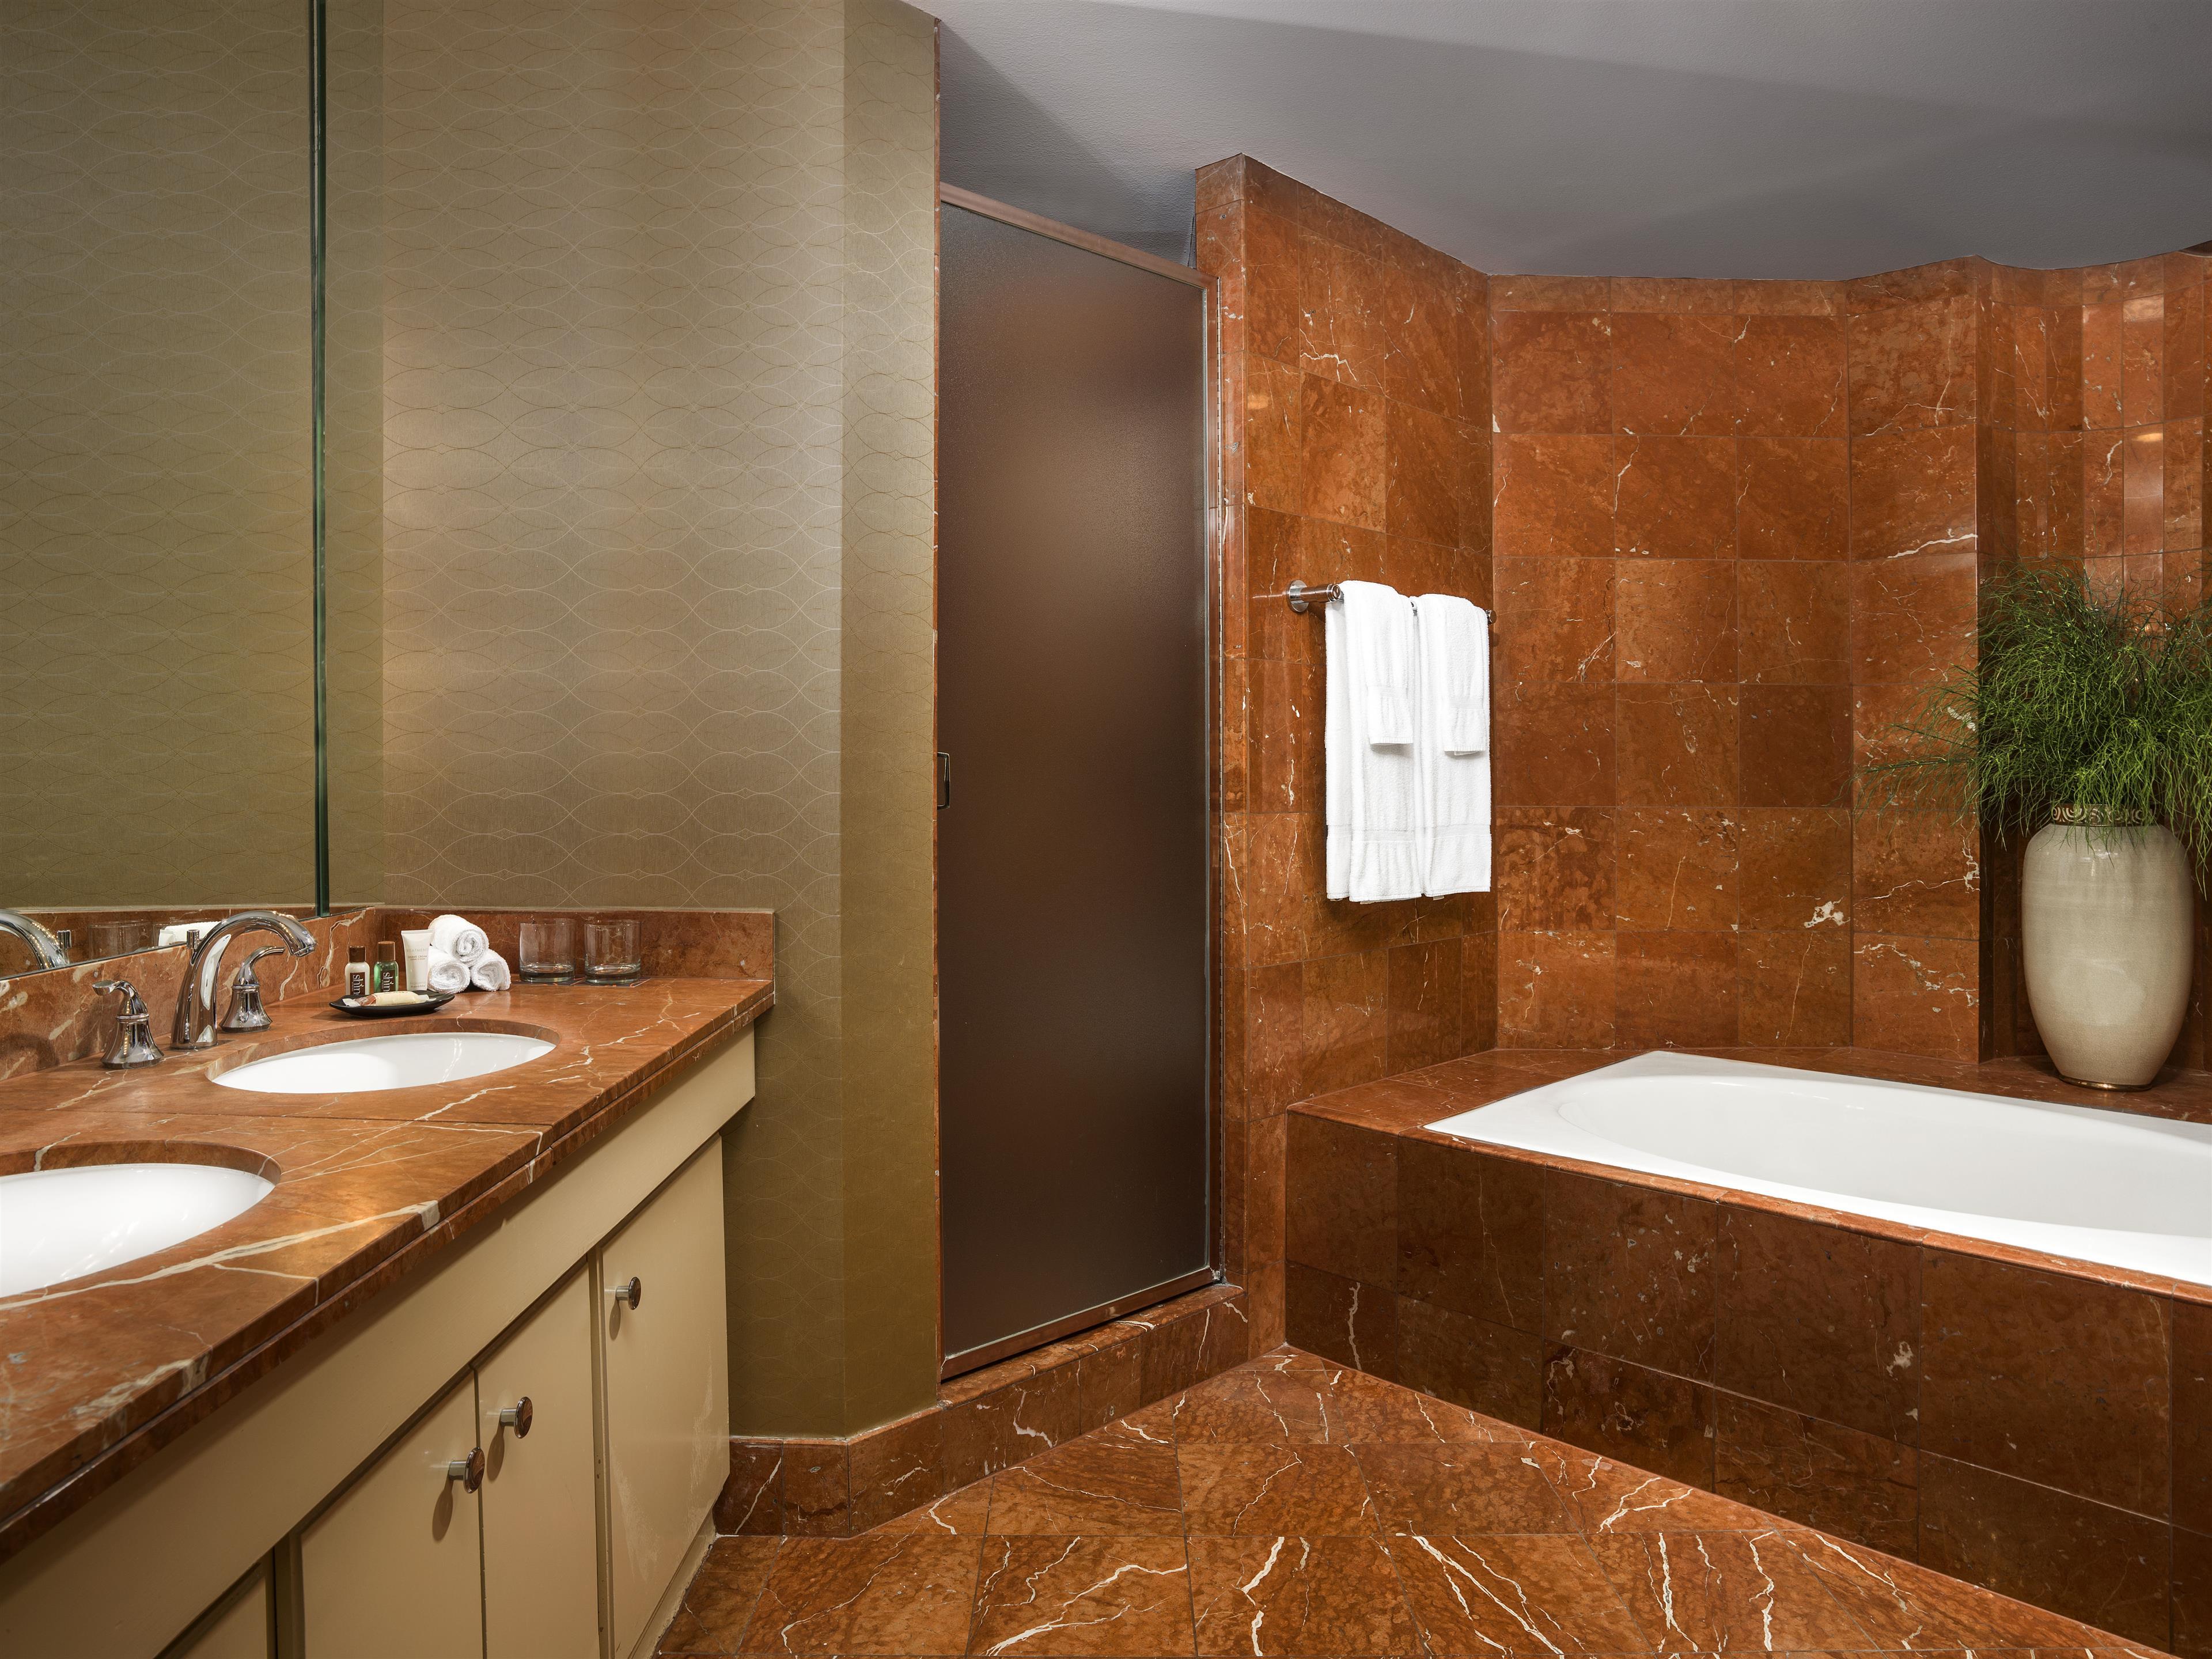 Sheraton Crescent Hotel image 5